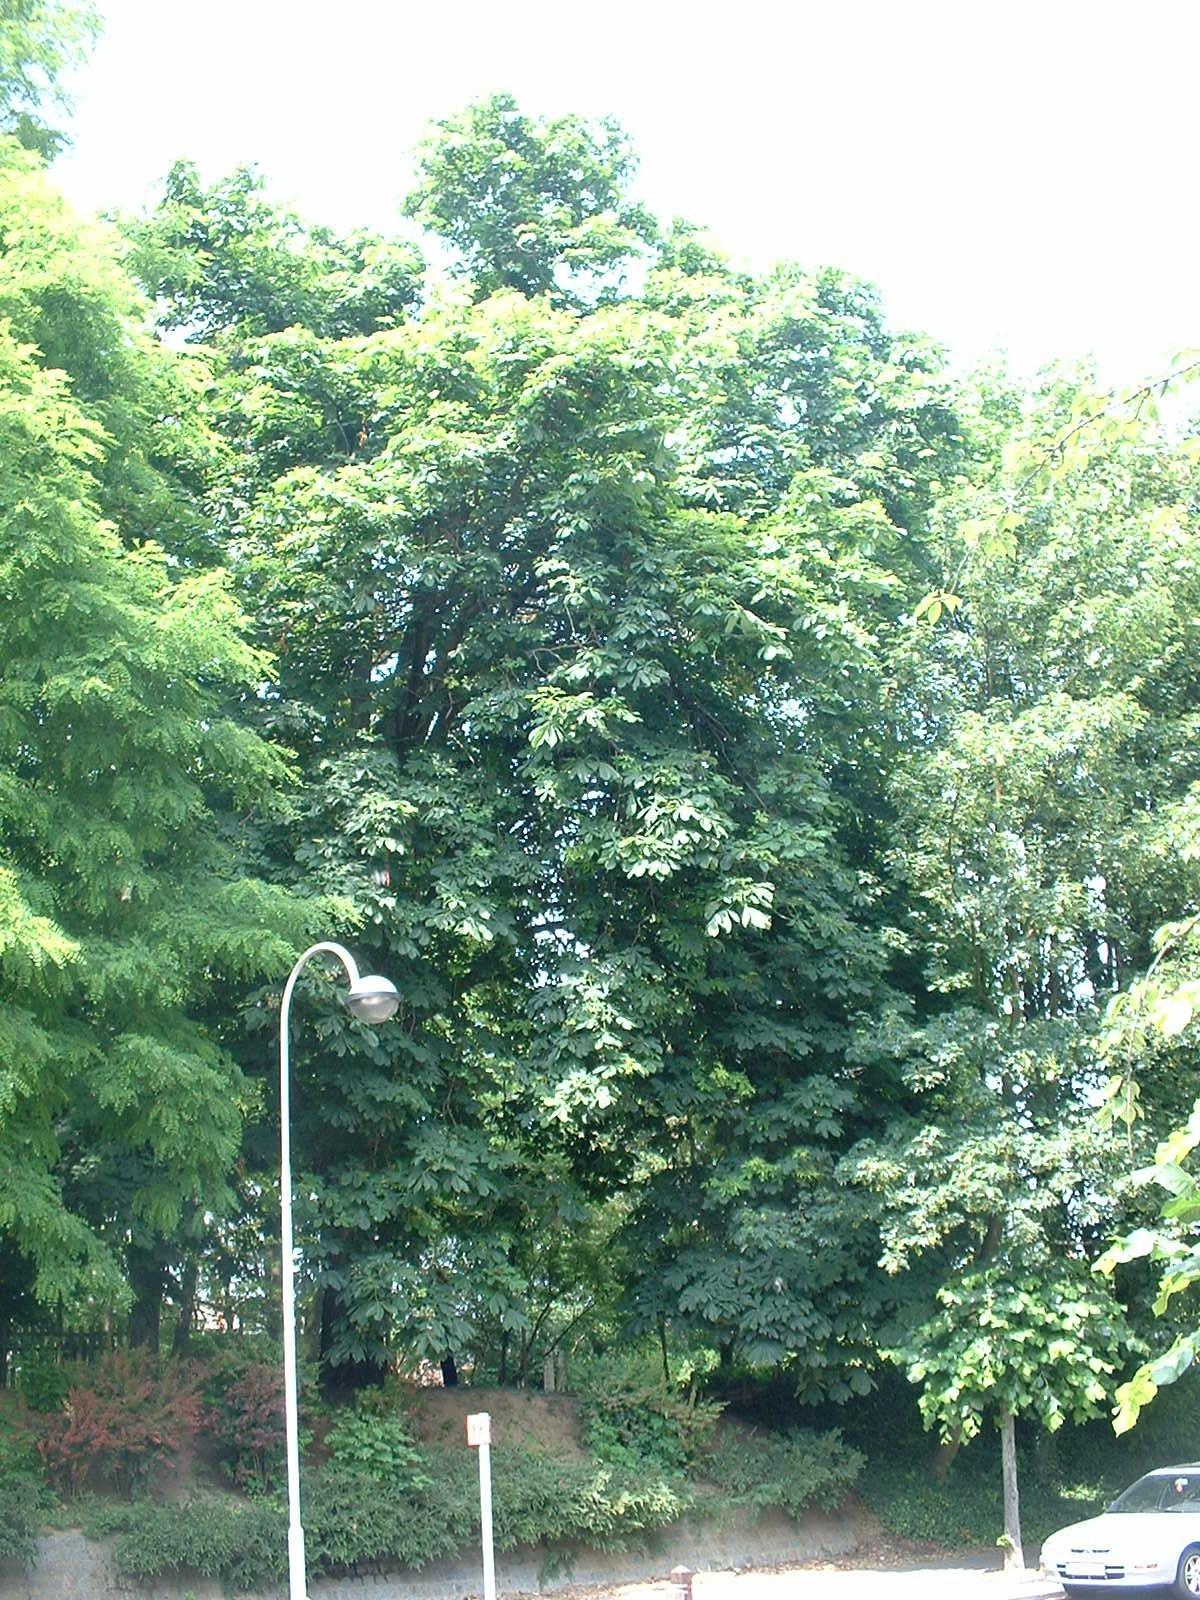 Marronnier commun – Molenbeek-Saint-Jean, Parc Hauwaert, parc –  09 Juin 2004